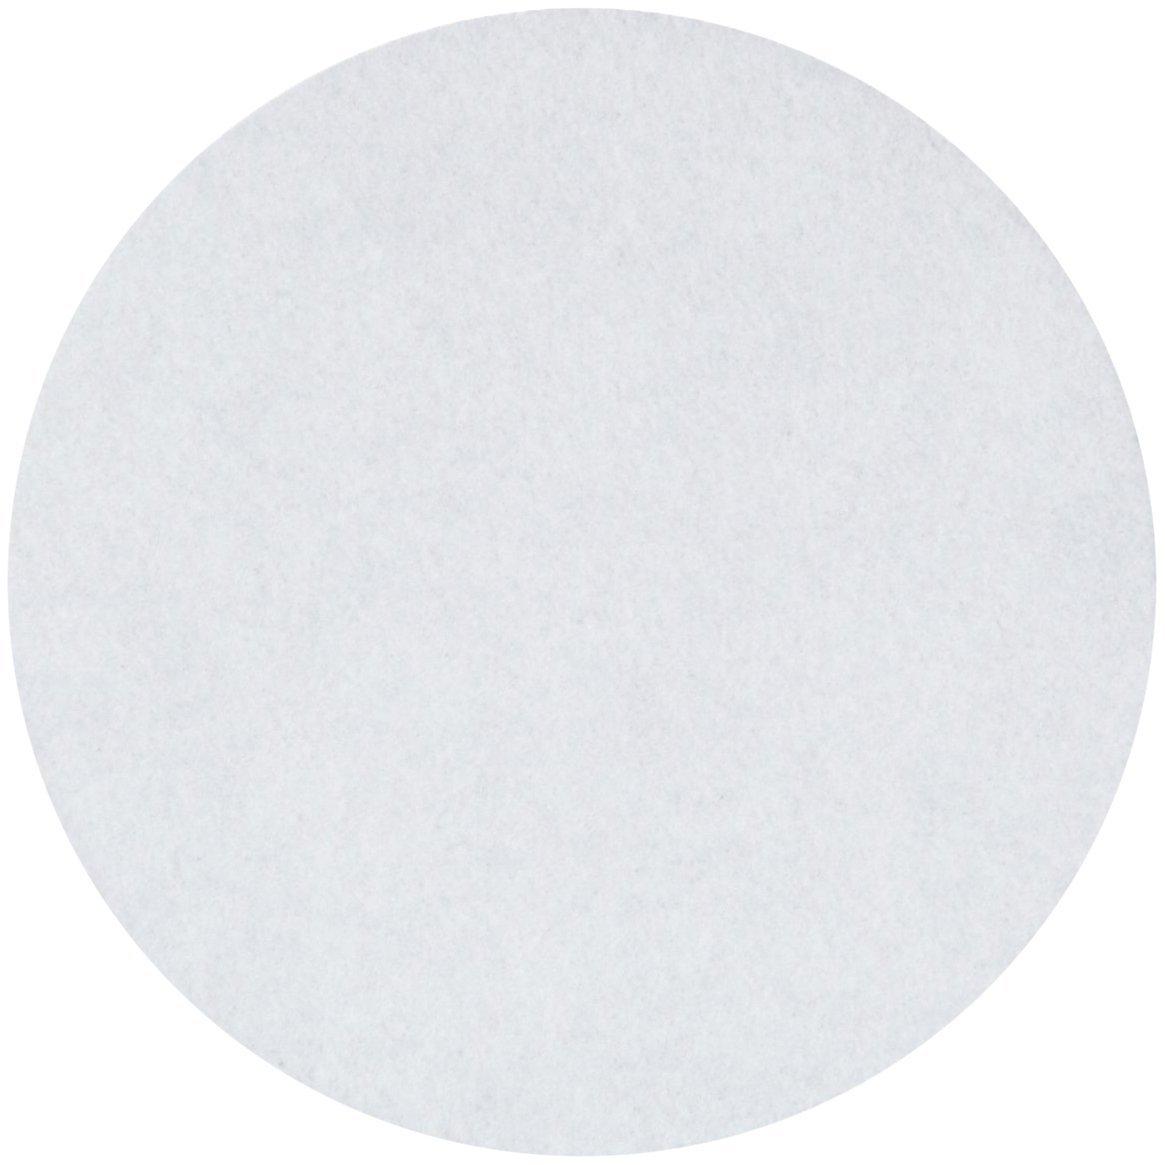 Pack of 100 110mm Diameter Grade 597 Whatman 10311810 Quantitative Filter Paper Circles 4-7 Micron